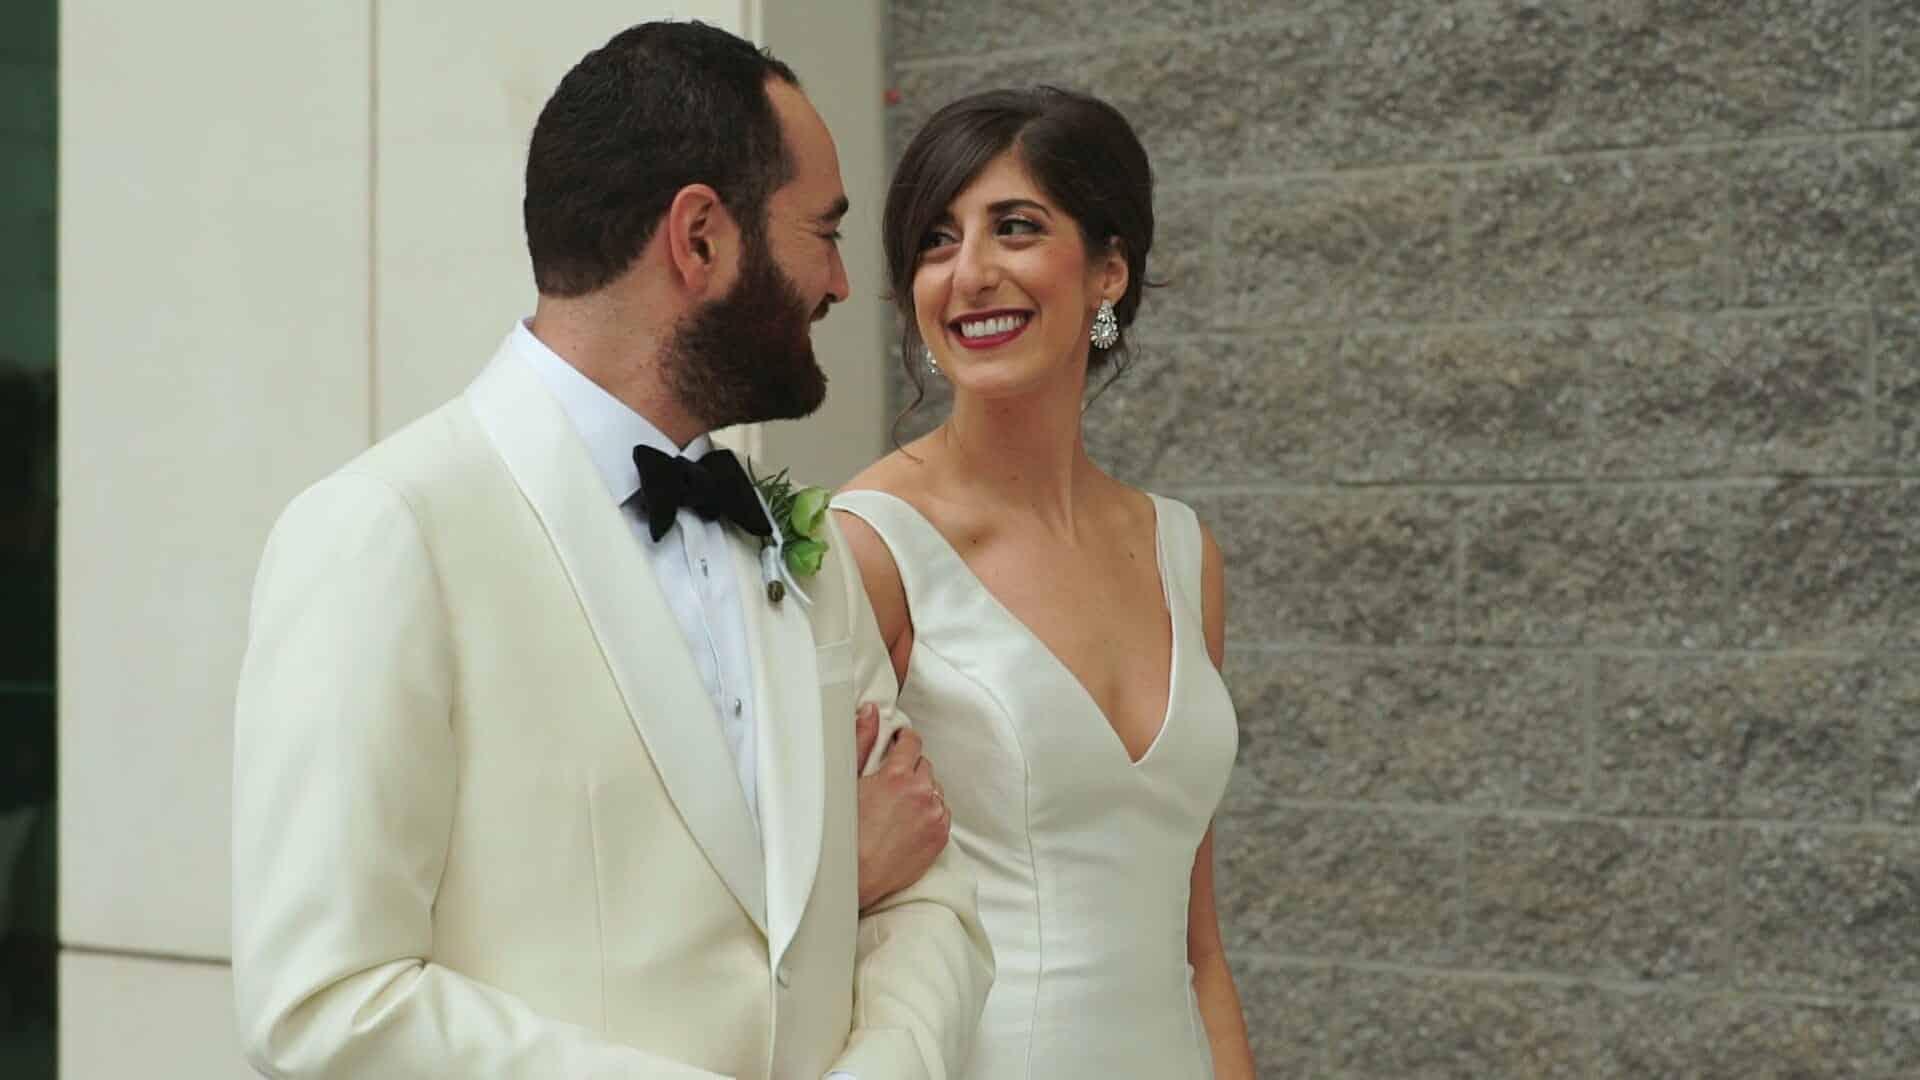 Downtown Charlotte Jewish Wedding